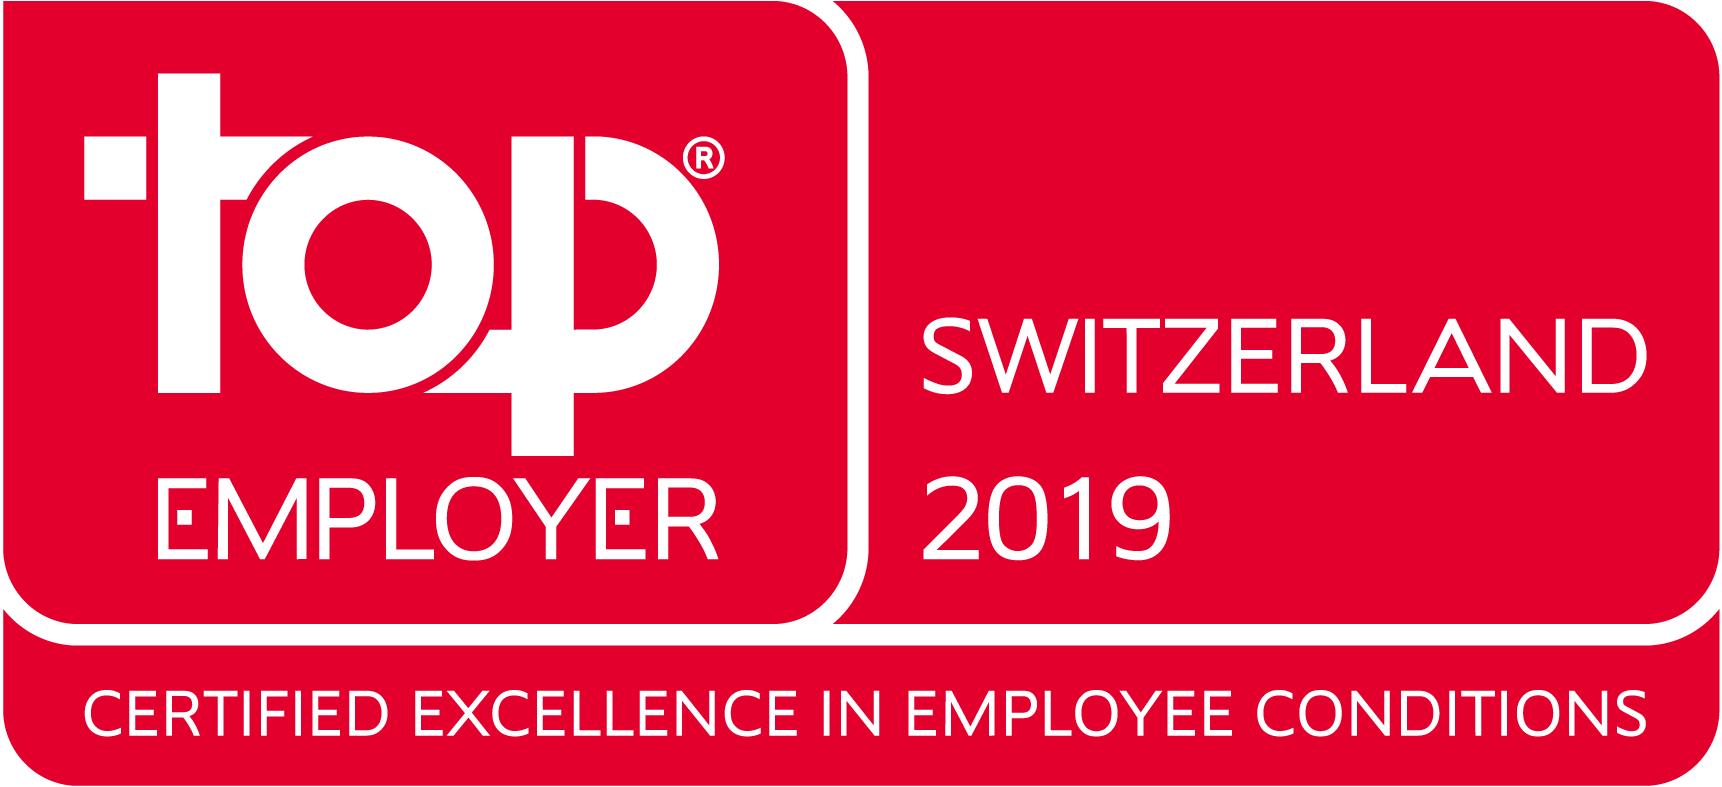 Top_Employer_Switzerland_English_2019